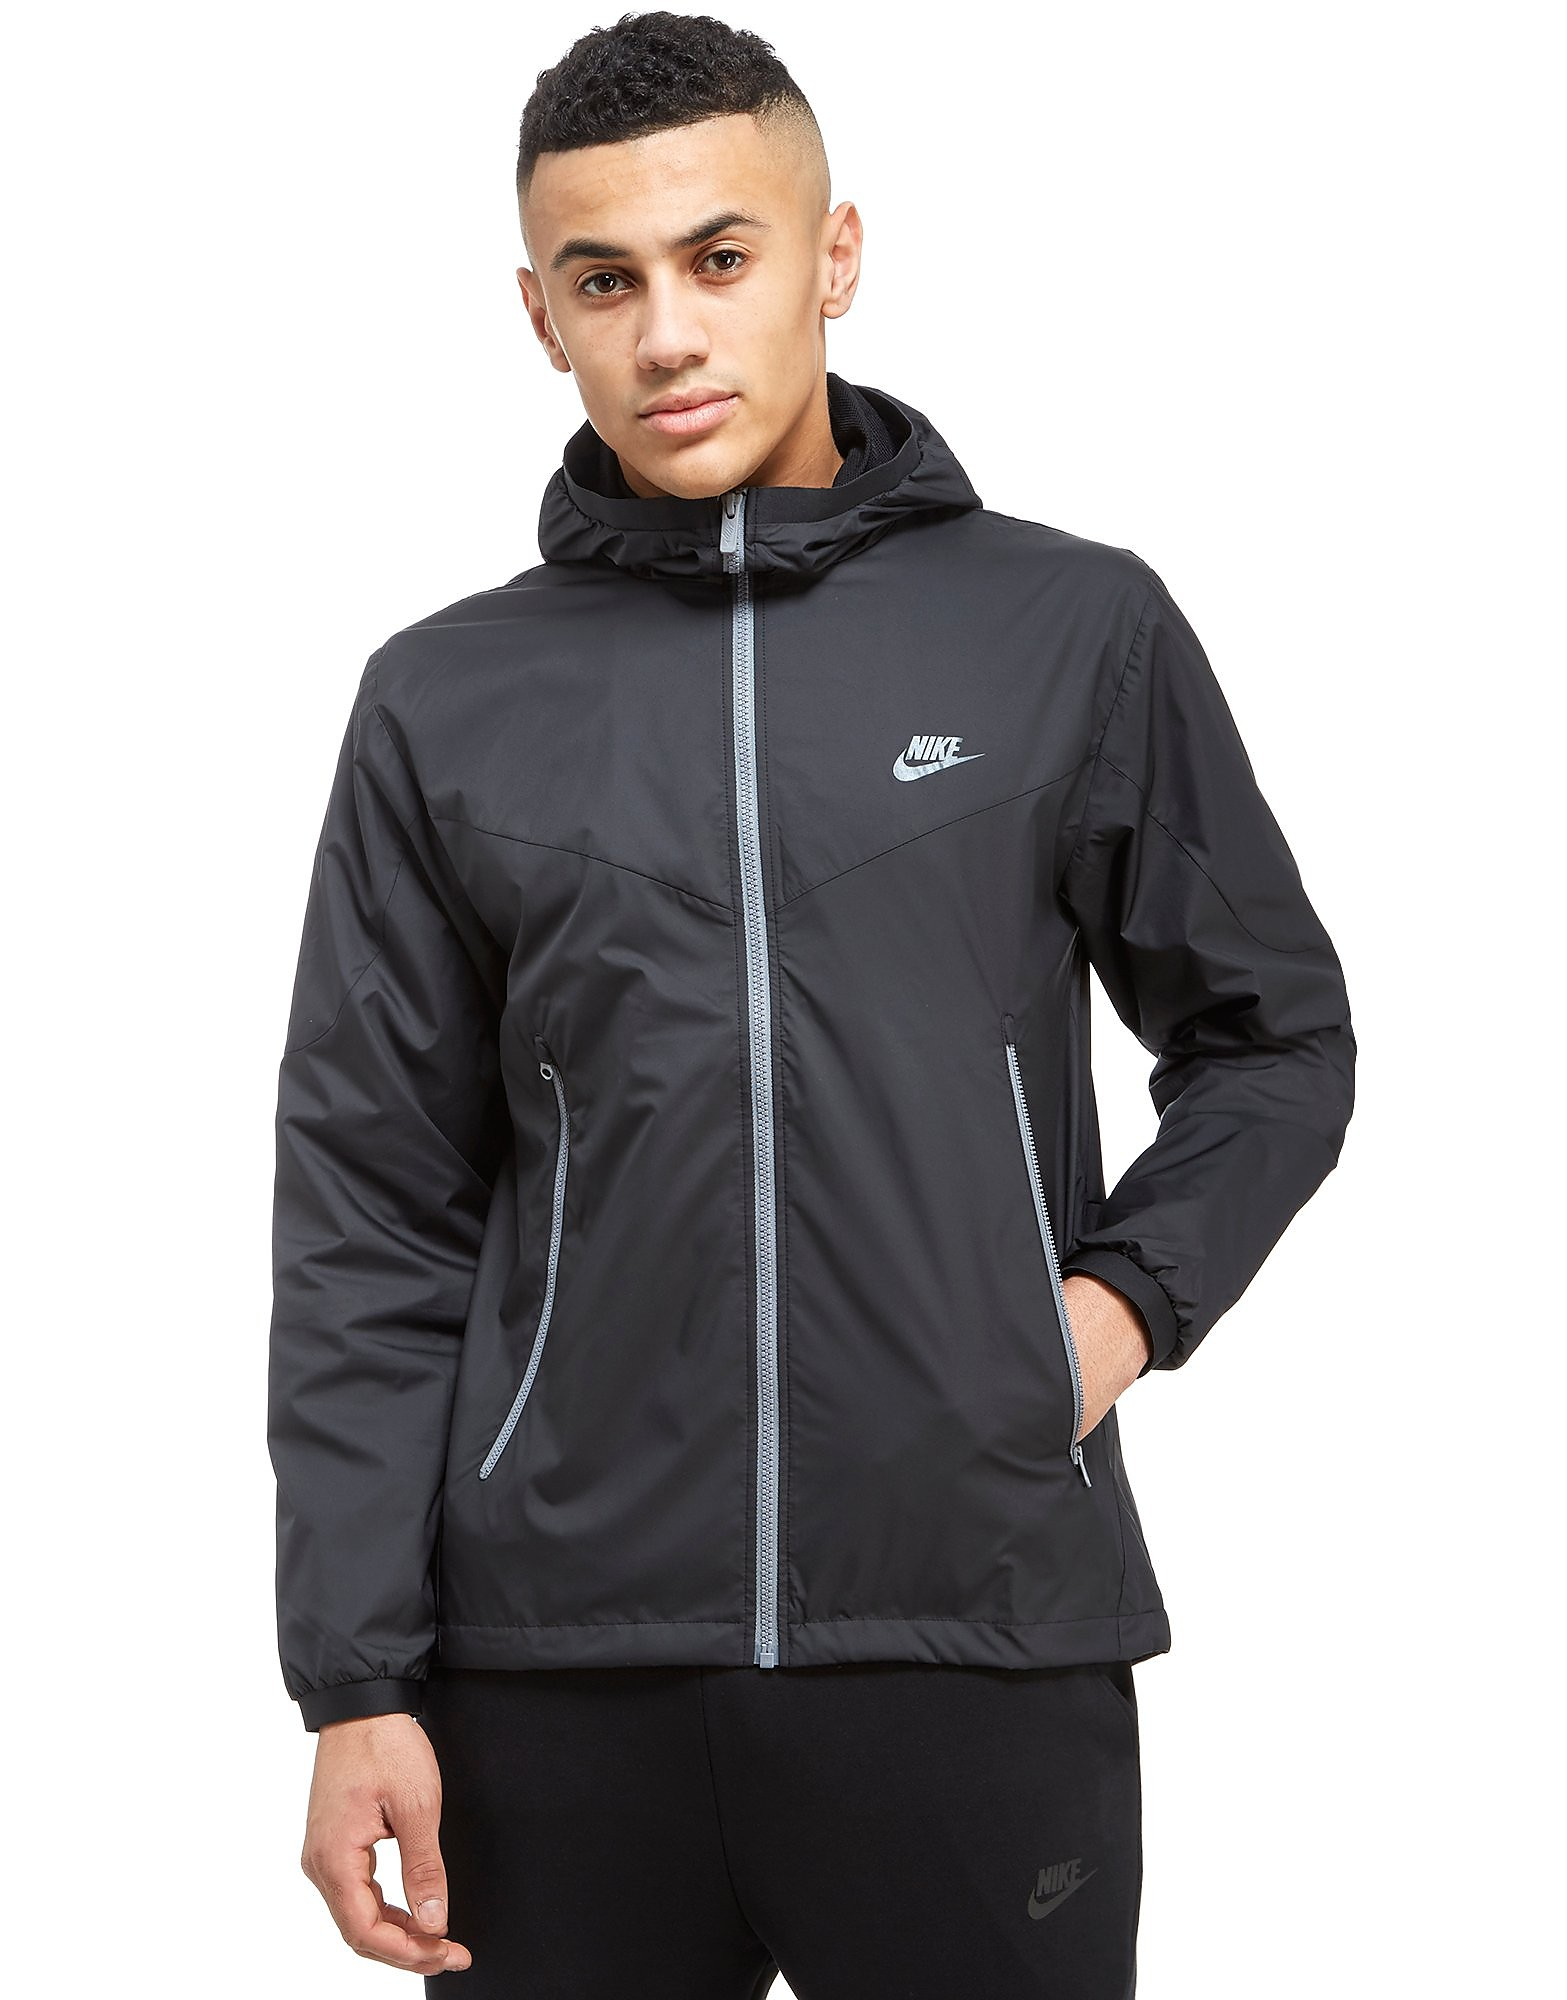 Nike Windrunner Packable Jacket